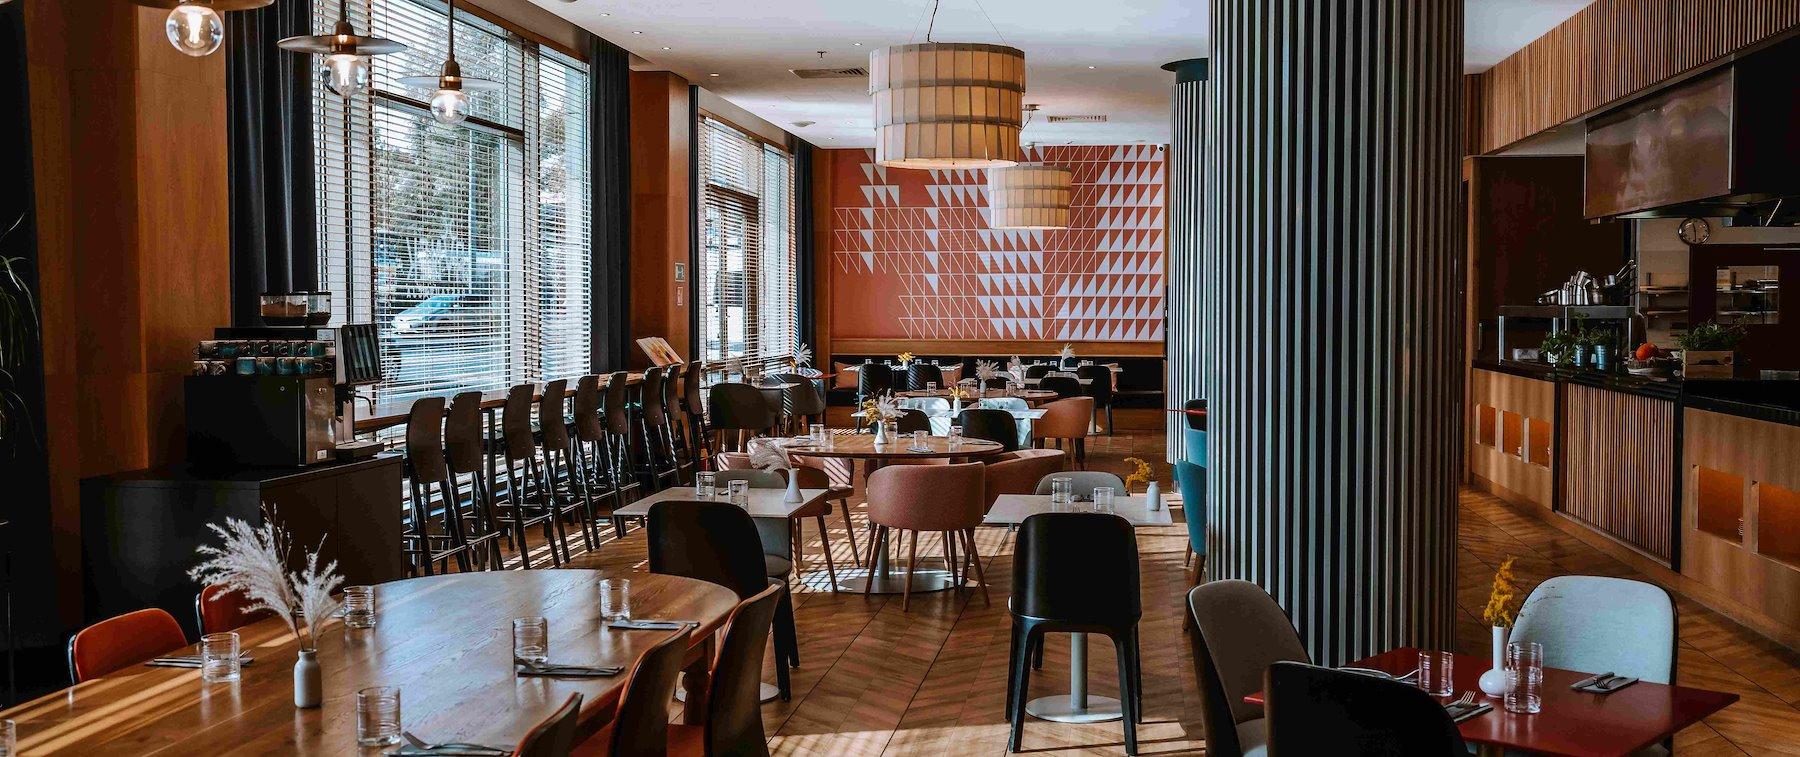 Sheraton Poznan restauracja